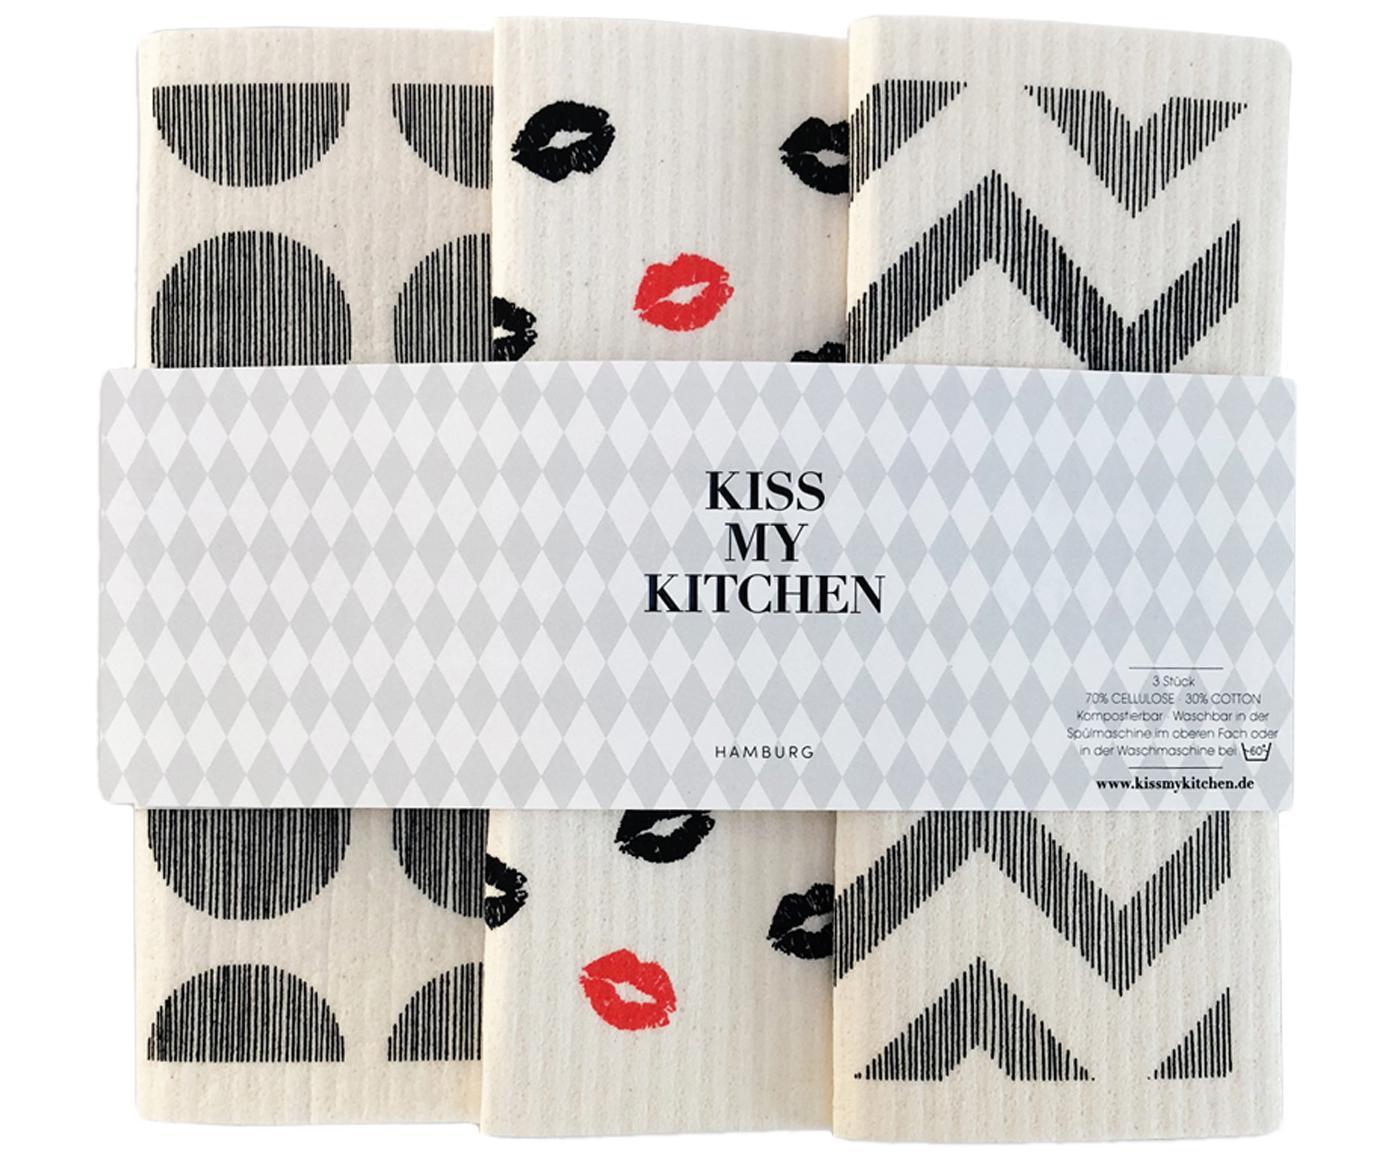 Sponsdoekenset Paris, 3-delig, 70% Cellulose, 30% katoen, Wit, grijs, rood, 17 x 20 cm